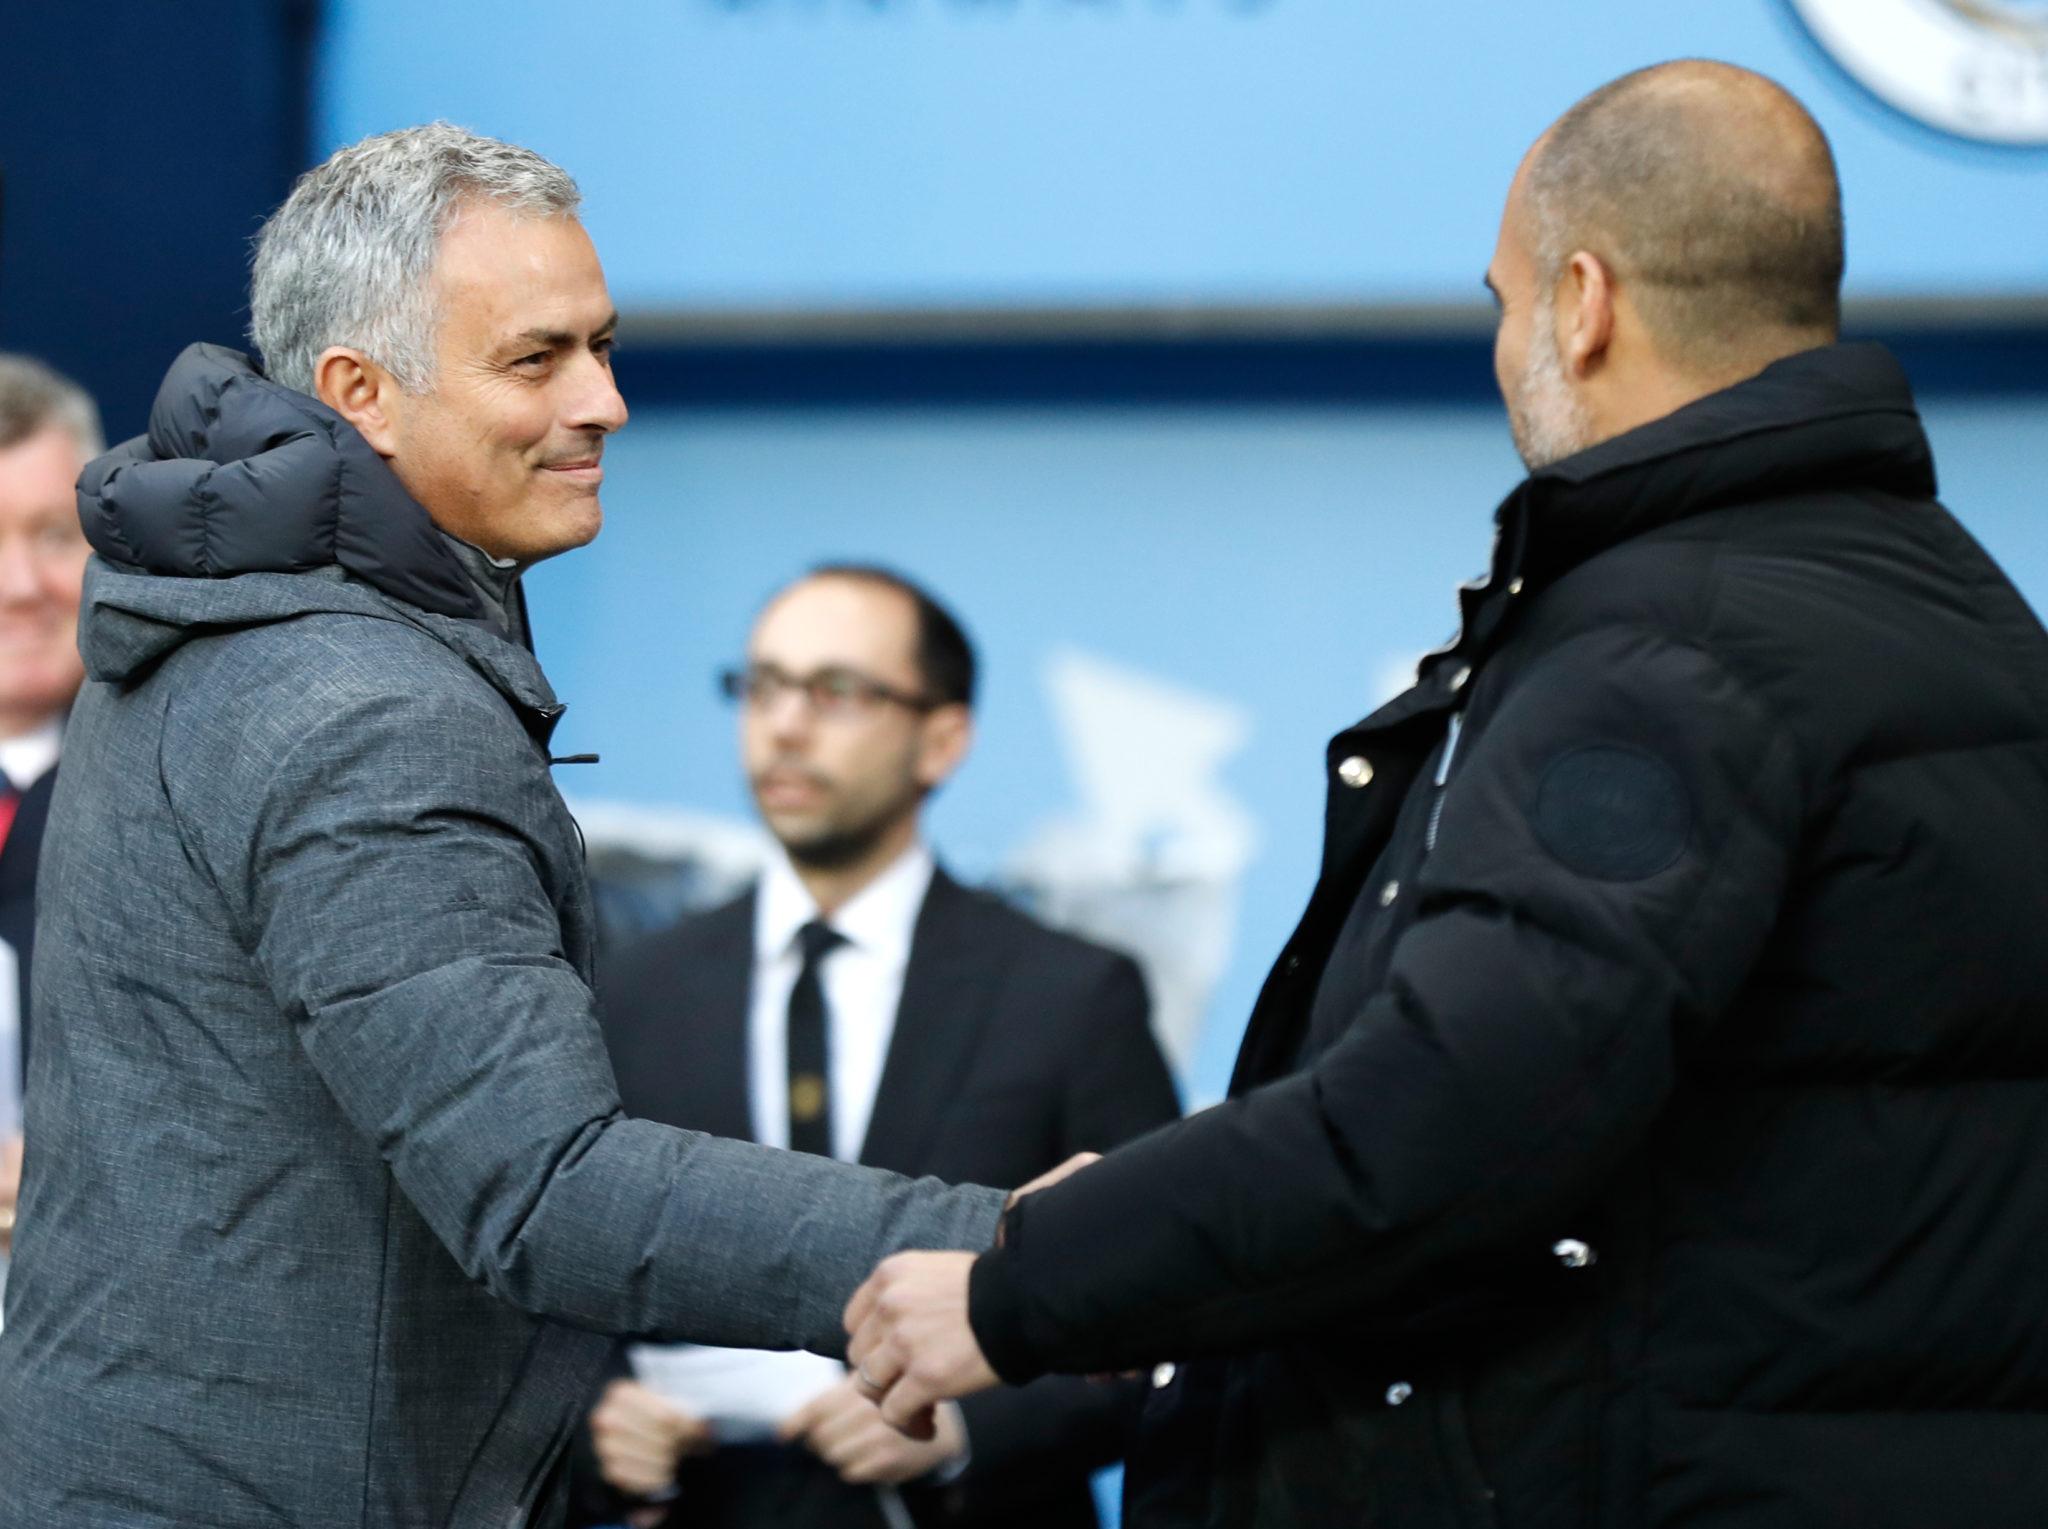 Pep Guardiola and Jose Mourinho shake hands